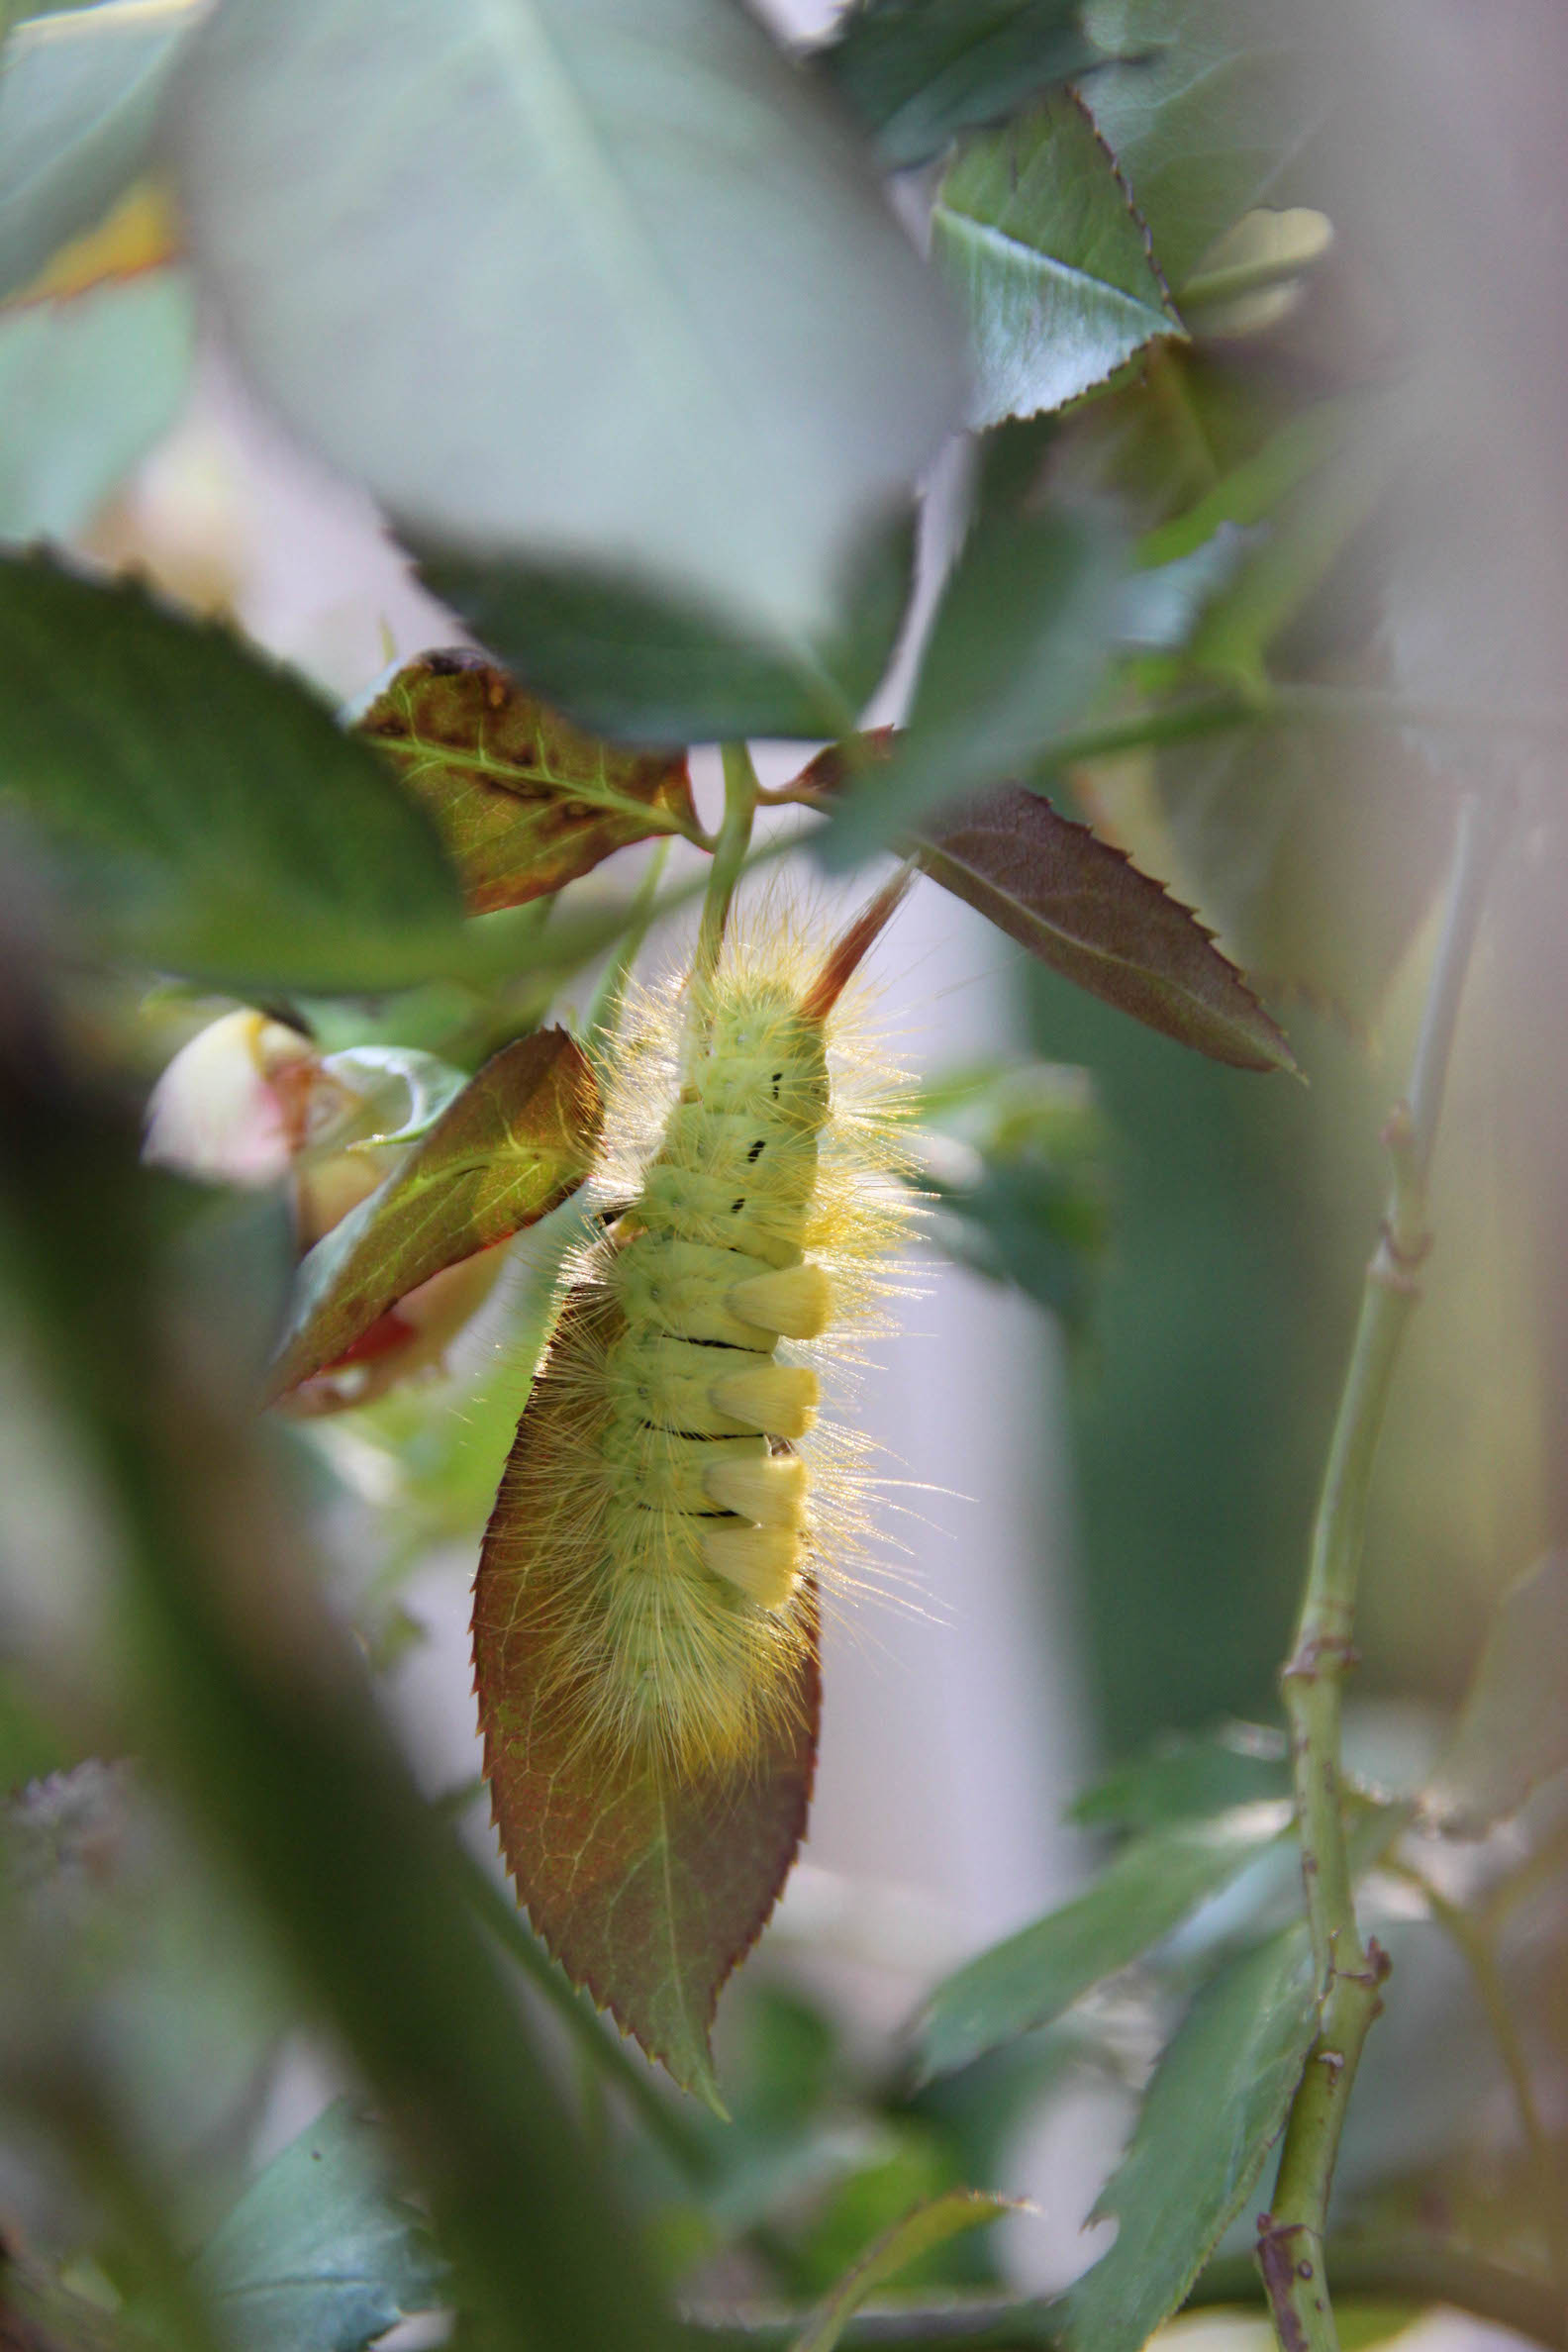 Chenille du papillon Orgie pudibonde